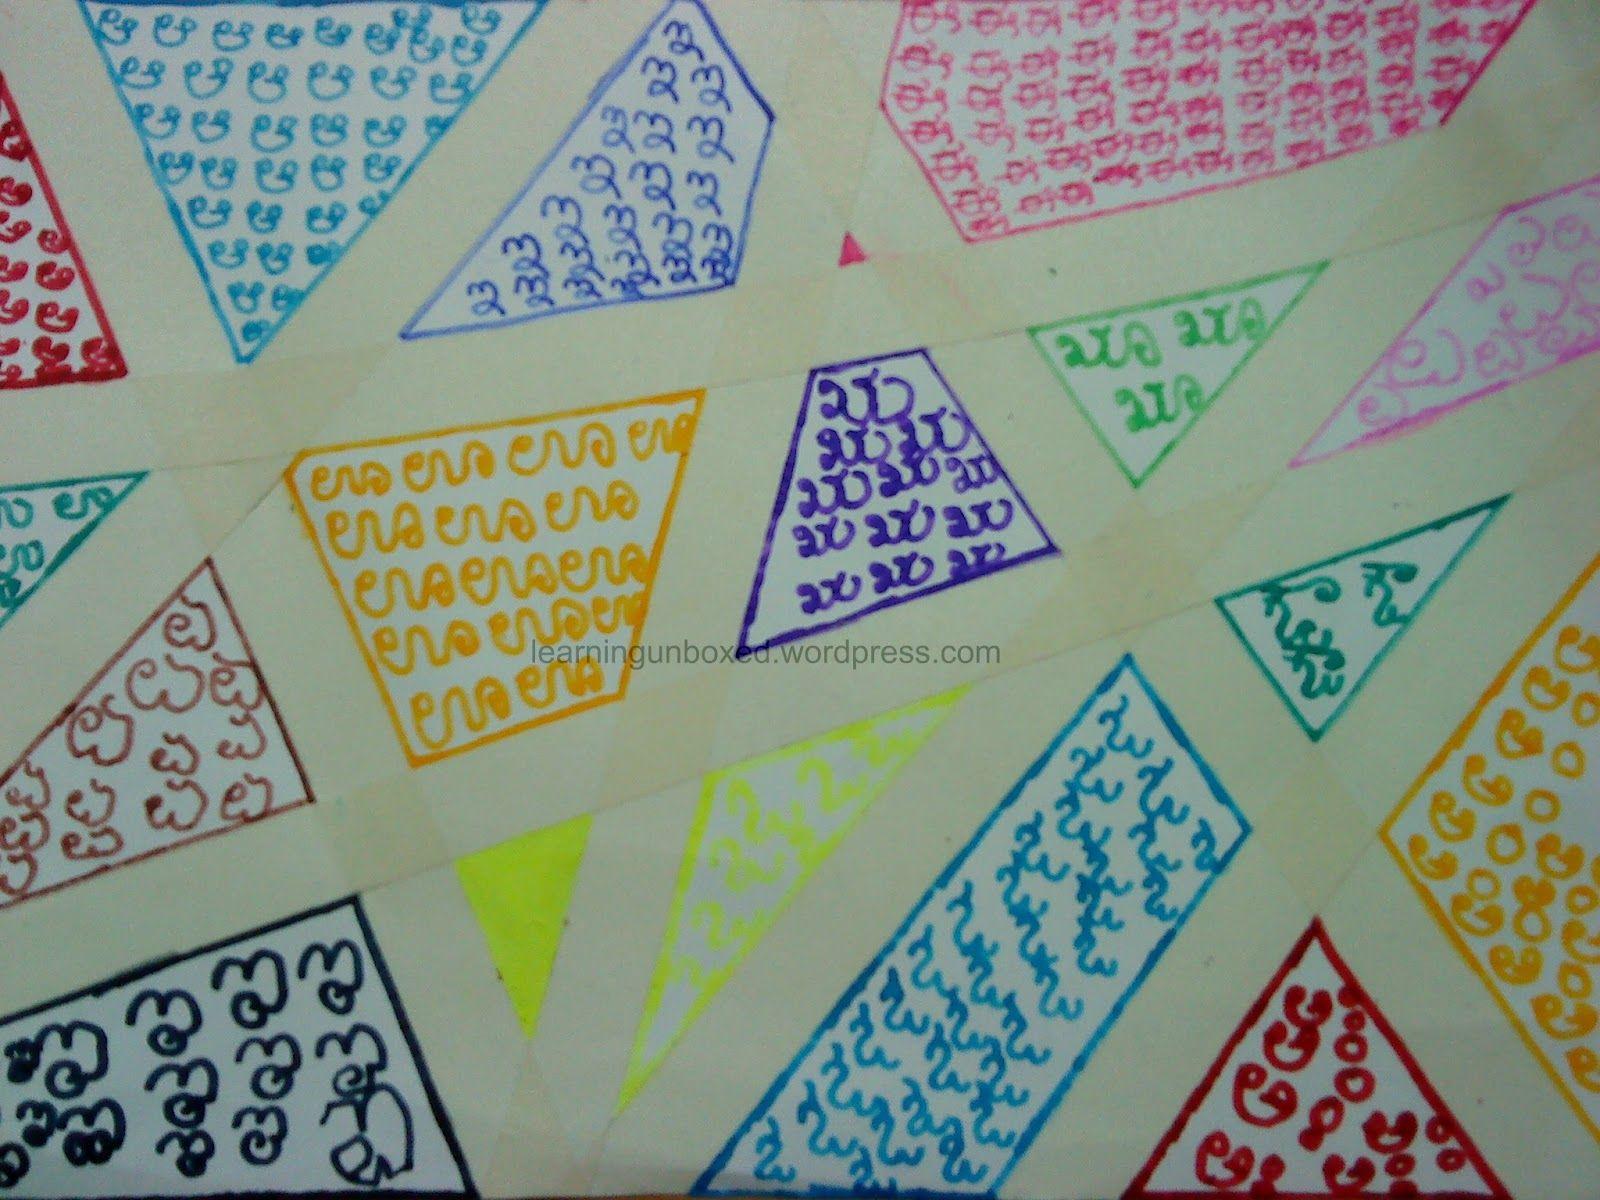 Kannada Alphabets In Tape Resist Art Writing Skills Arts And Crafts School Photos [ 1200 x 1600 Pixel ]